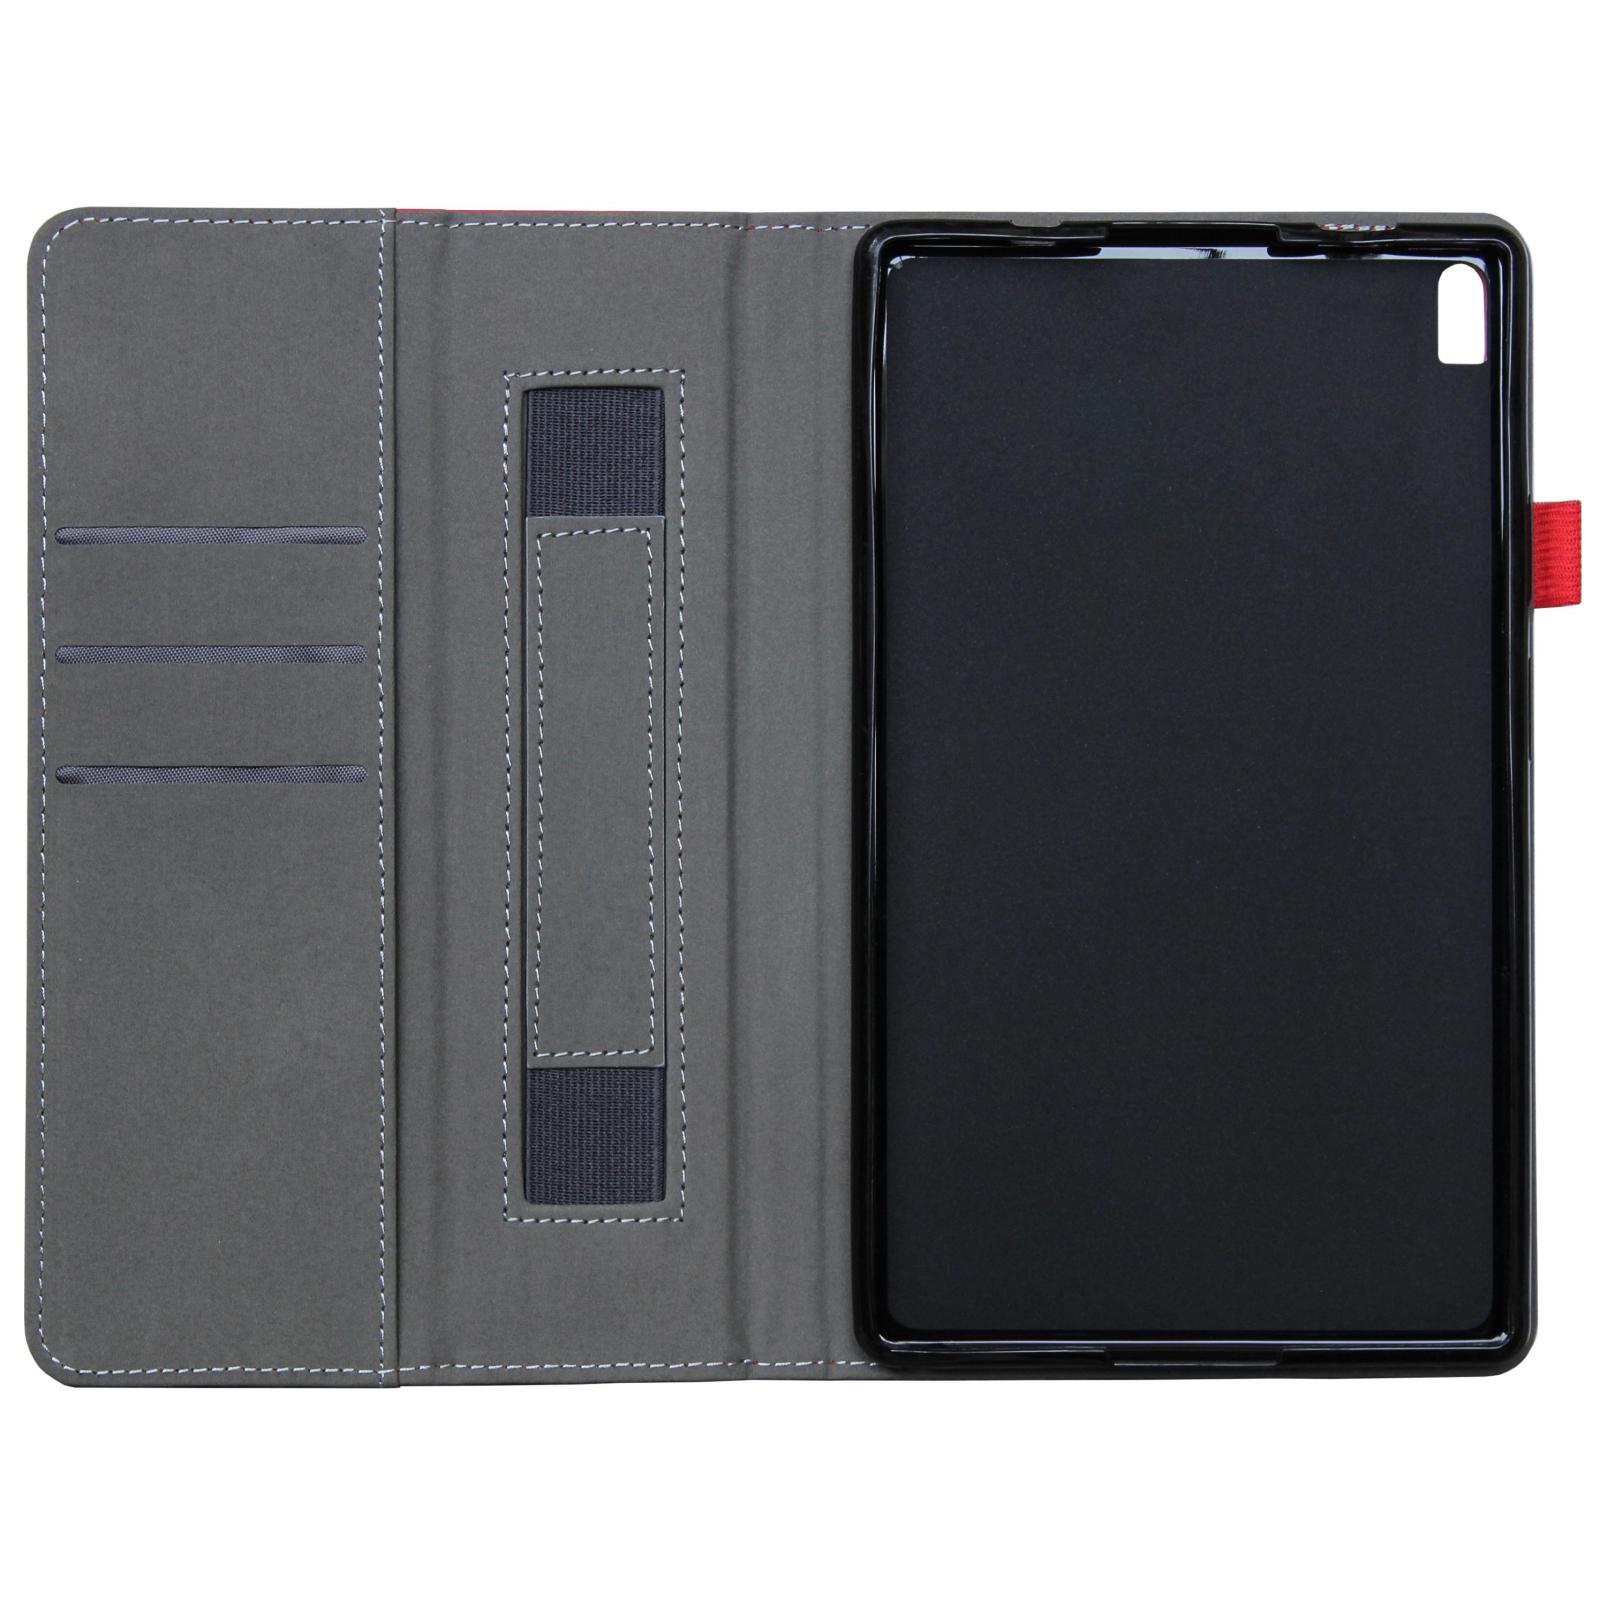 Чехол для планшета Grand-X для Lenovo TAB4 8 Plus TB-8704 Business Class Red (LTC-LT48PBR) изображение 4